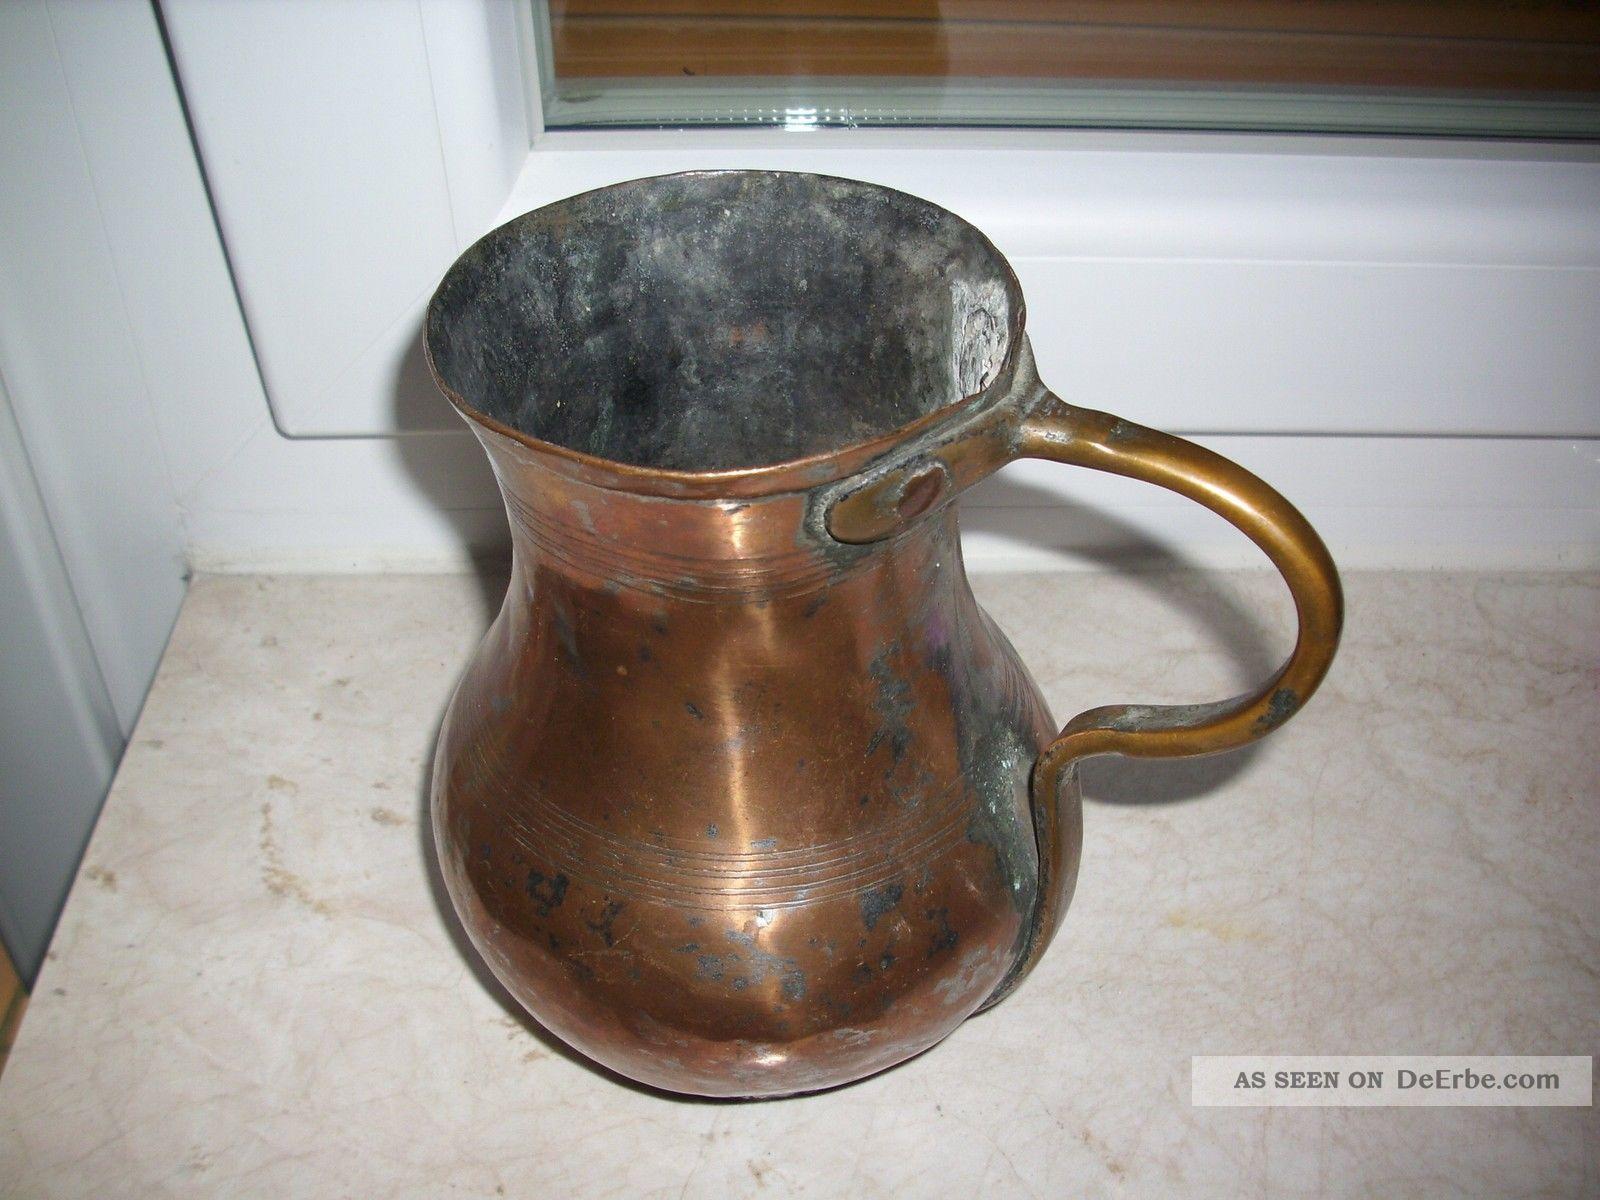 alter krug kupfer kanne topf vase alt deko dekoration nostalgie larp